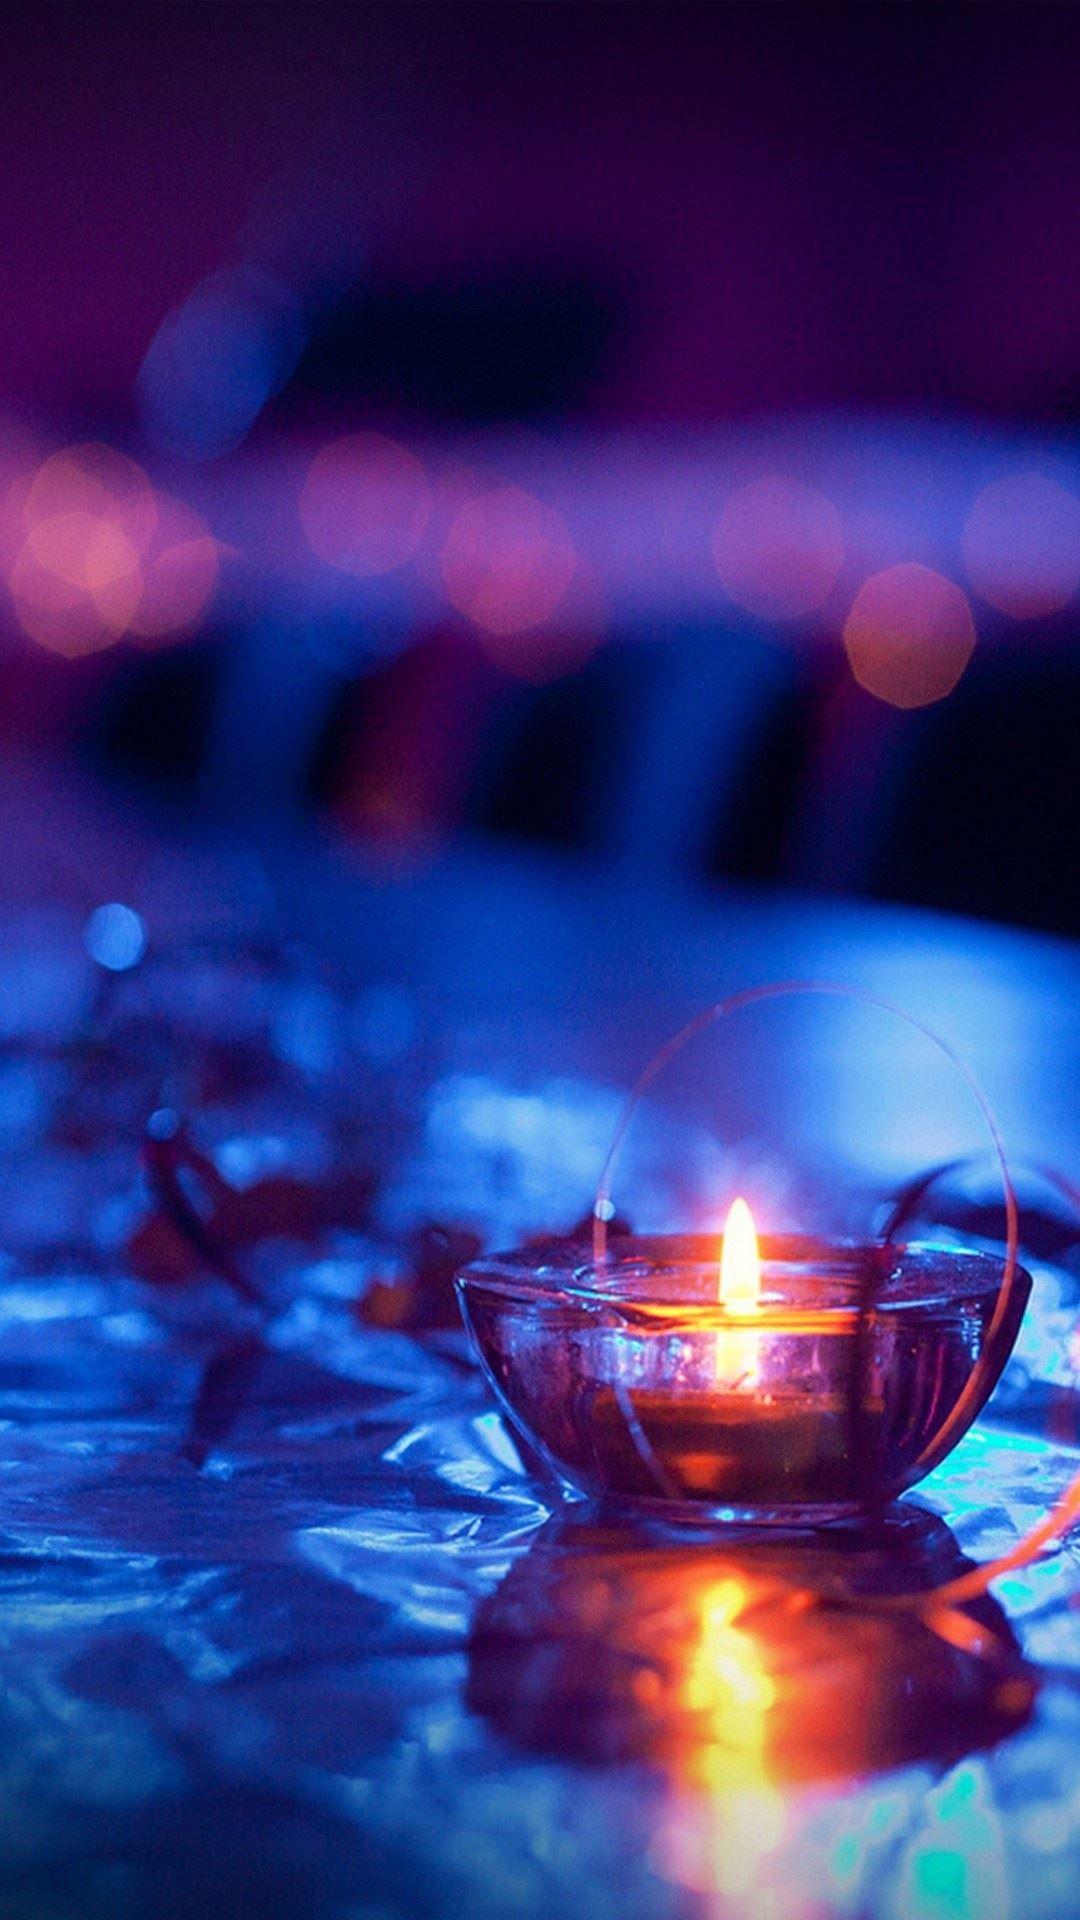 Candle Light iPhone 6 Plus HD Wallpaper.jpg (1080×1920